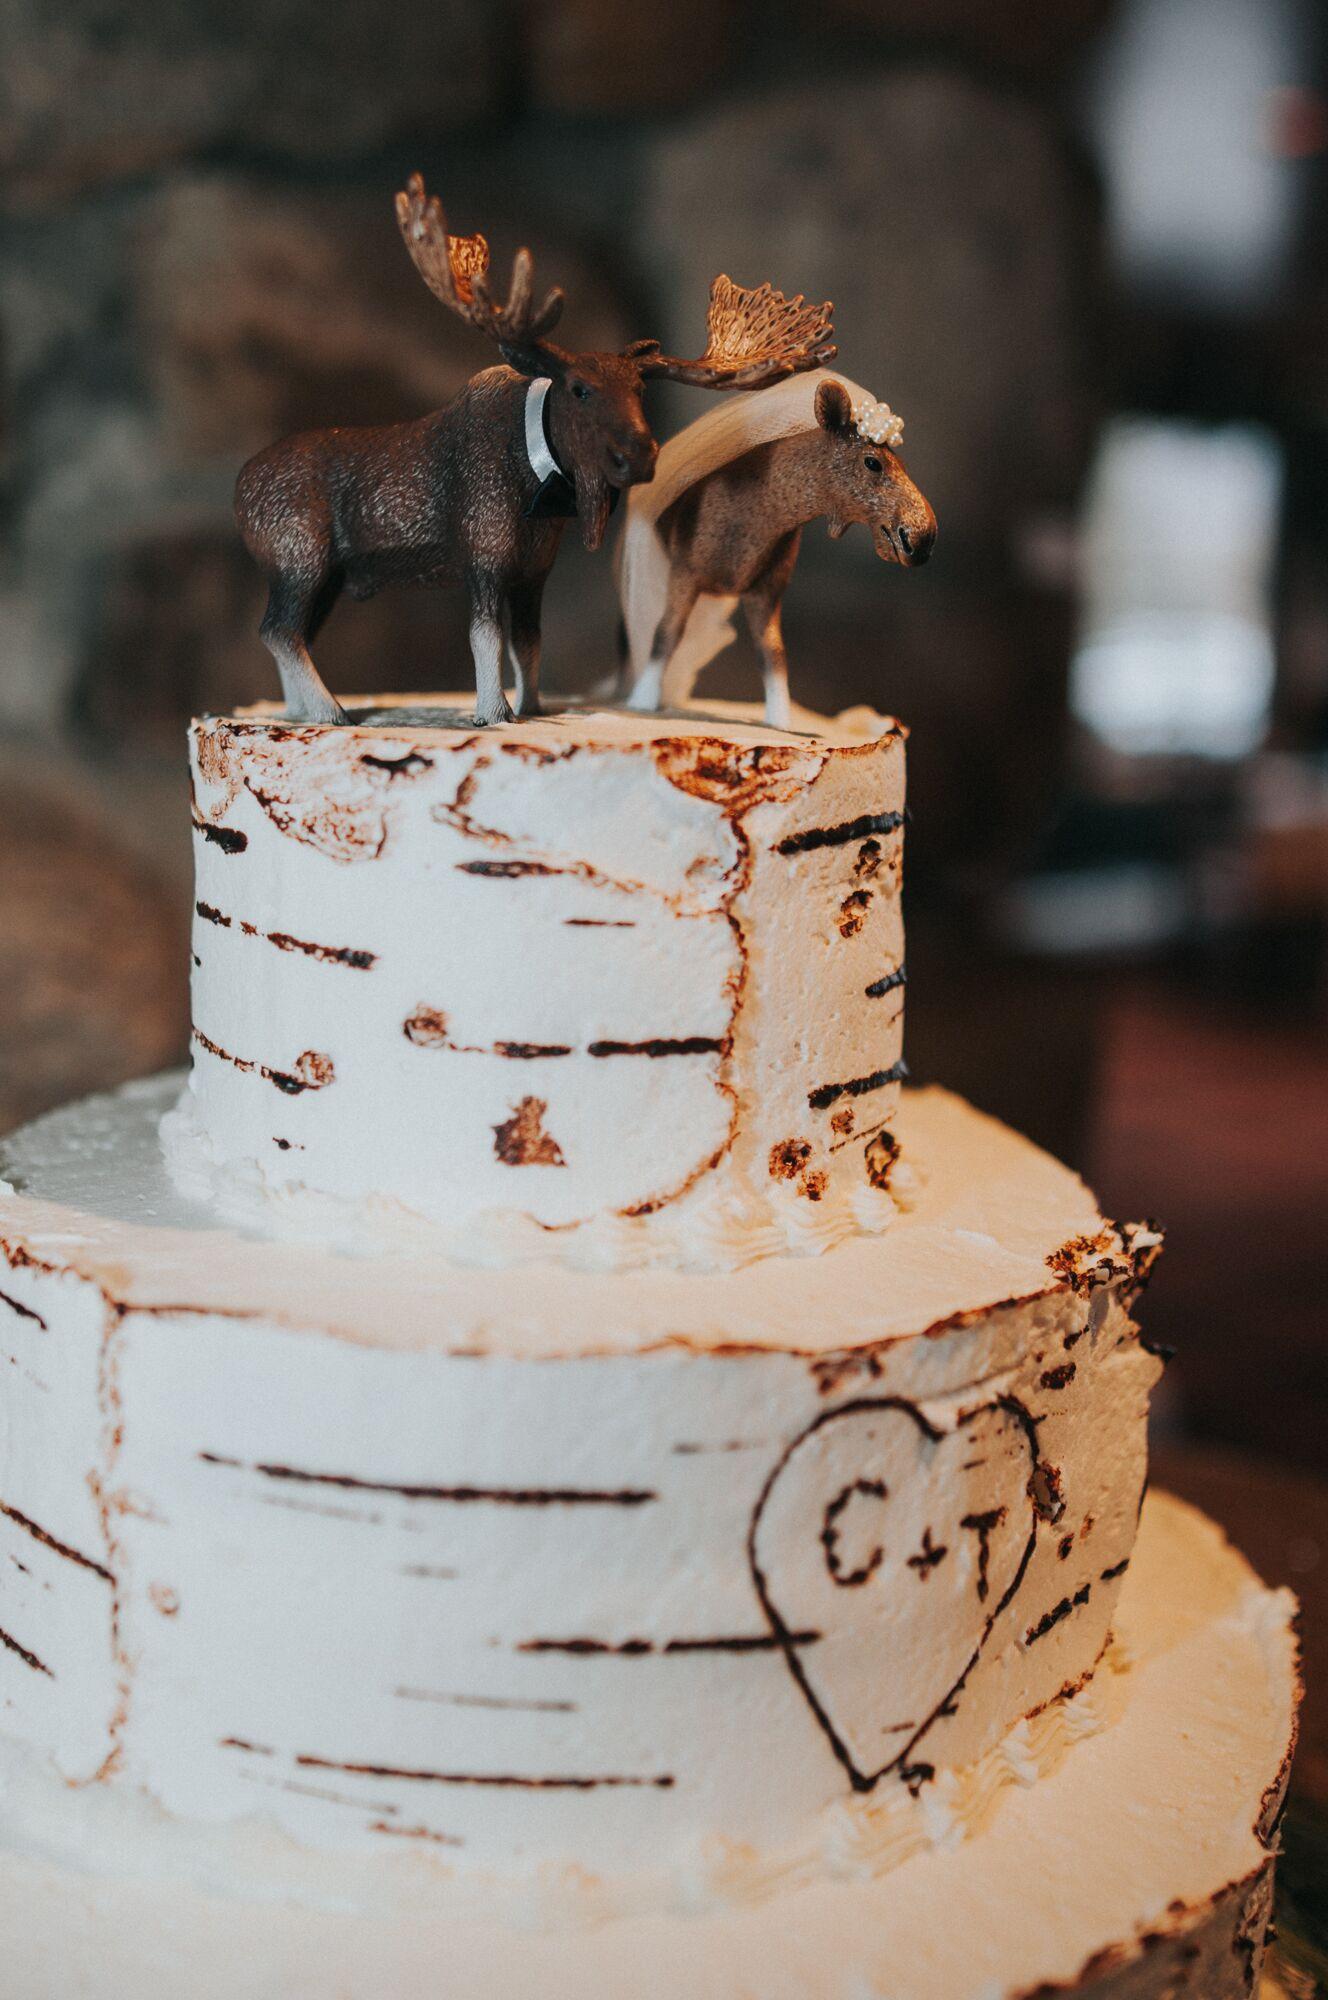 Lodge Mountain Trees Rustic Wood Engraved Cake Top Moose Wedding Cake Topper